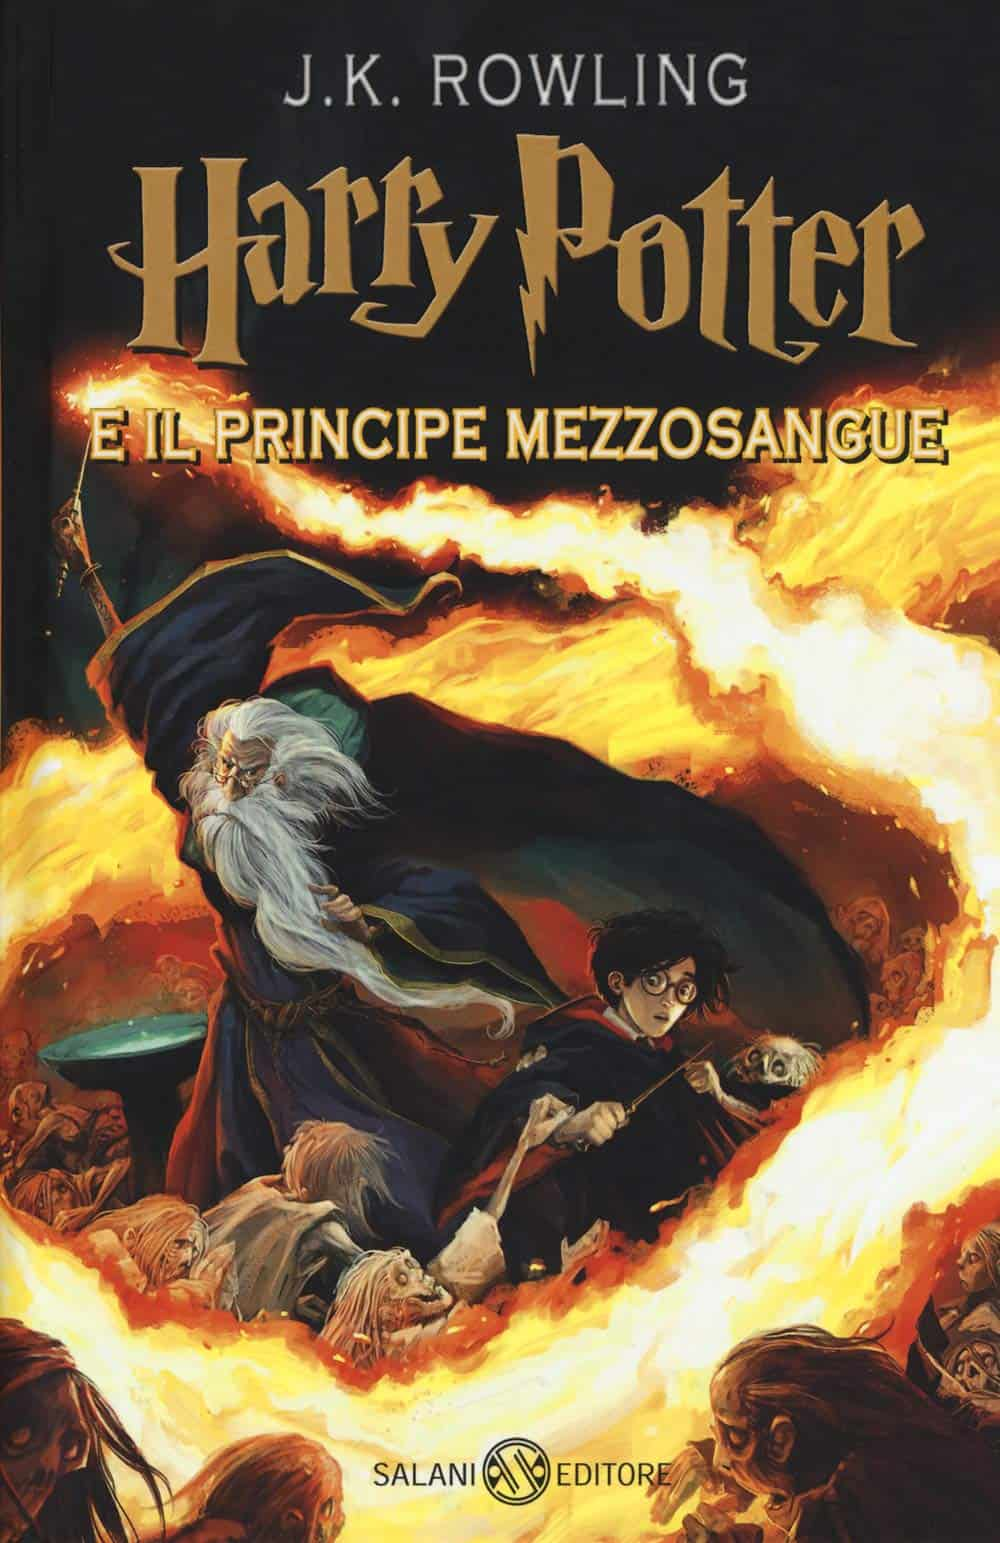 harry-potter-il-principe-mezzosangue-jonny-duddle